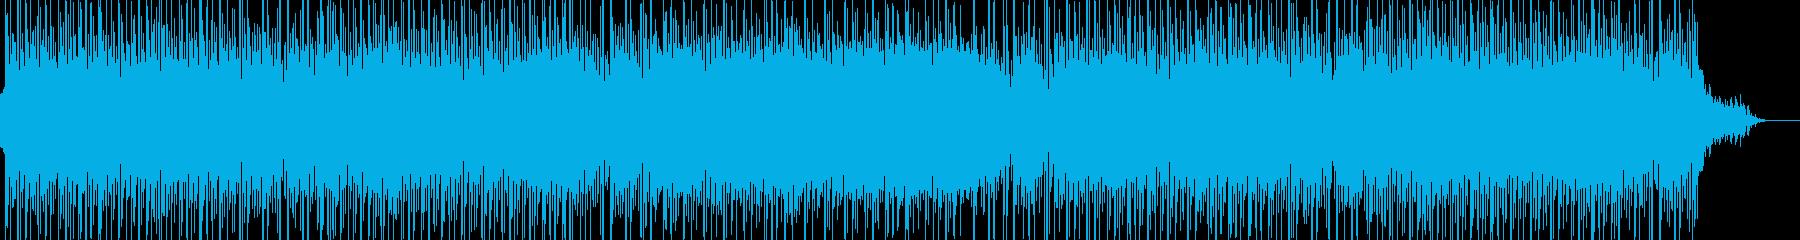 Future bassのようなムンベの再生済みの波形